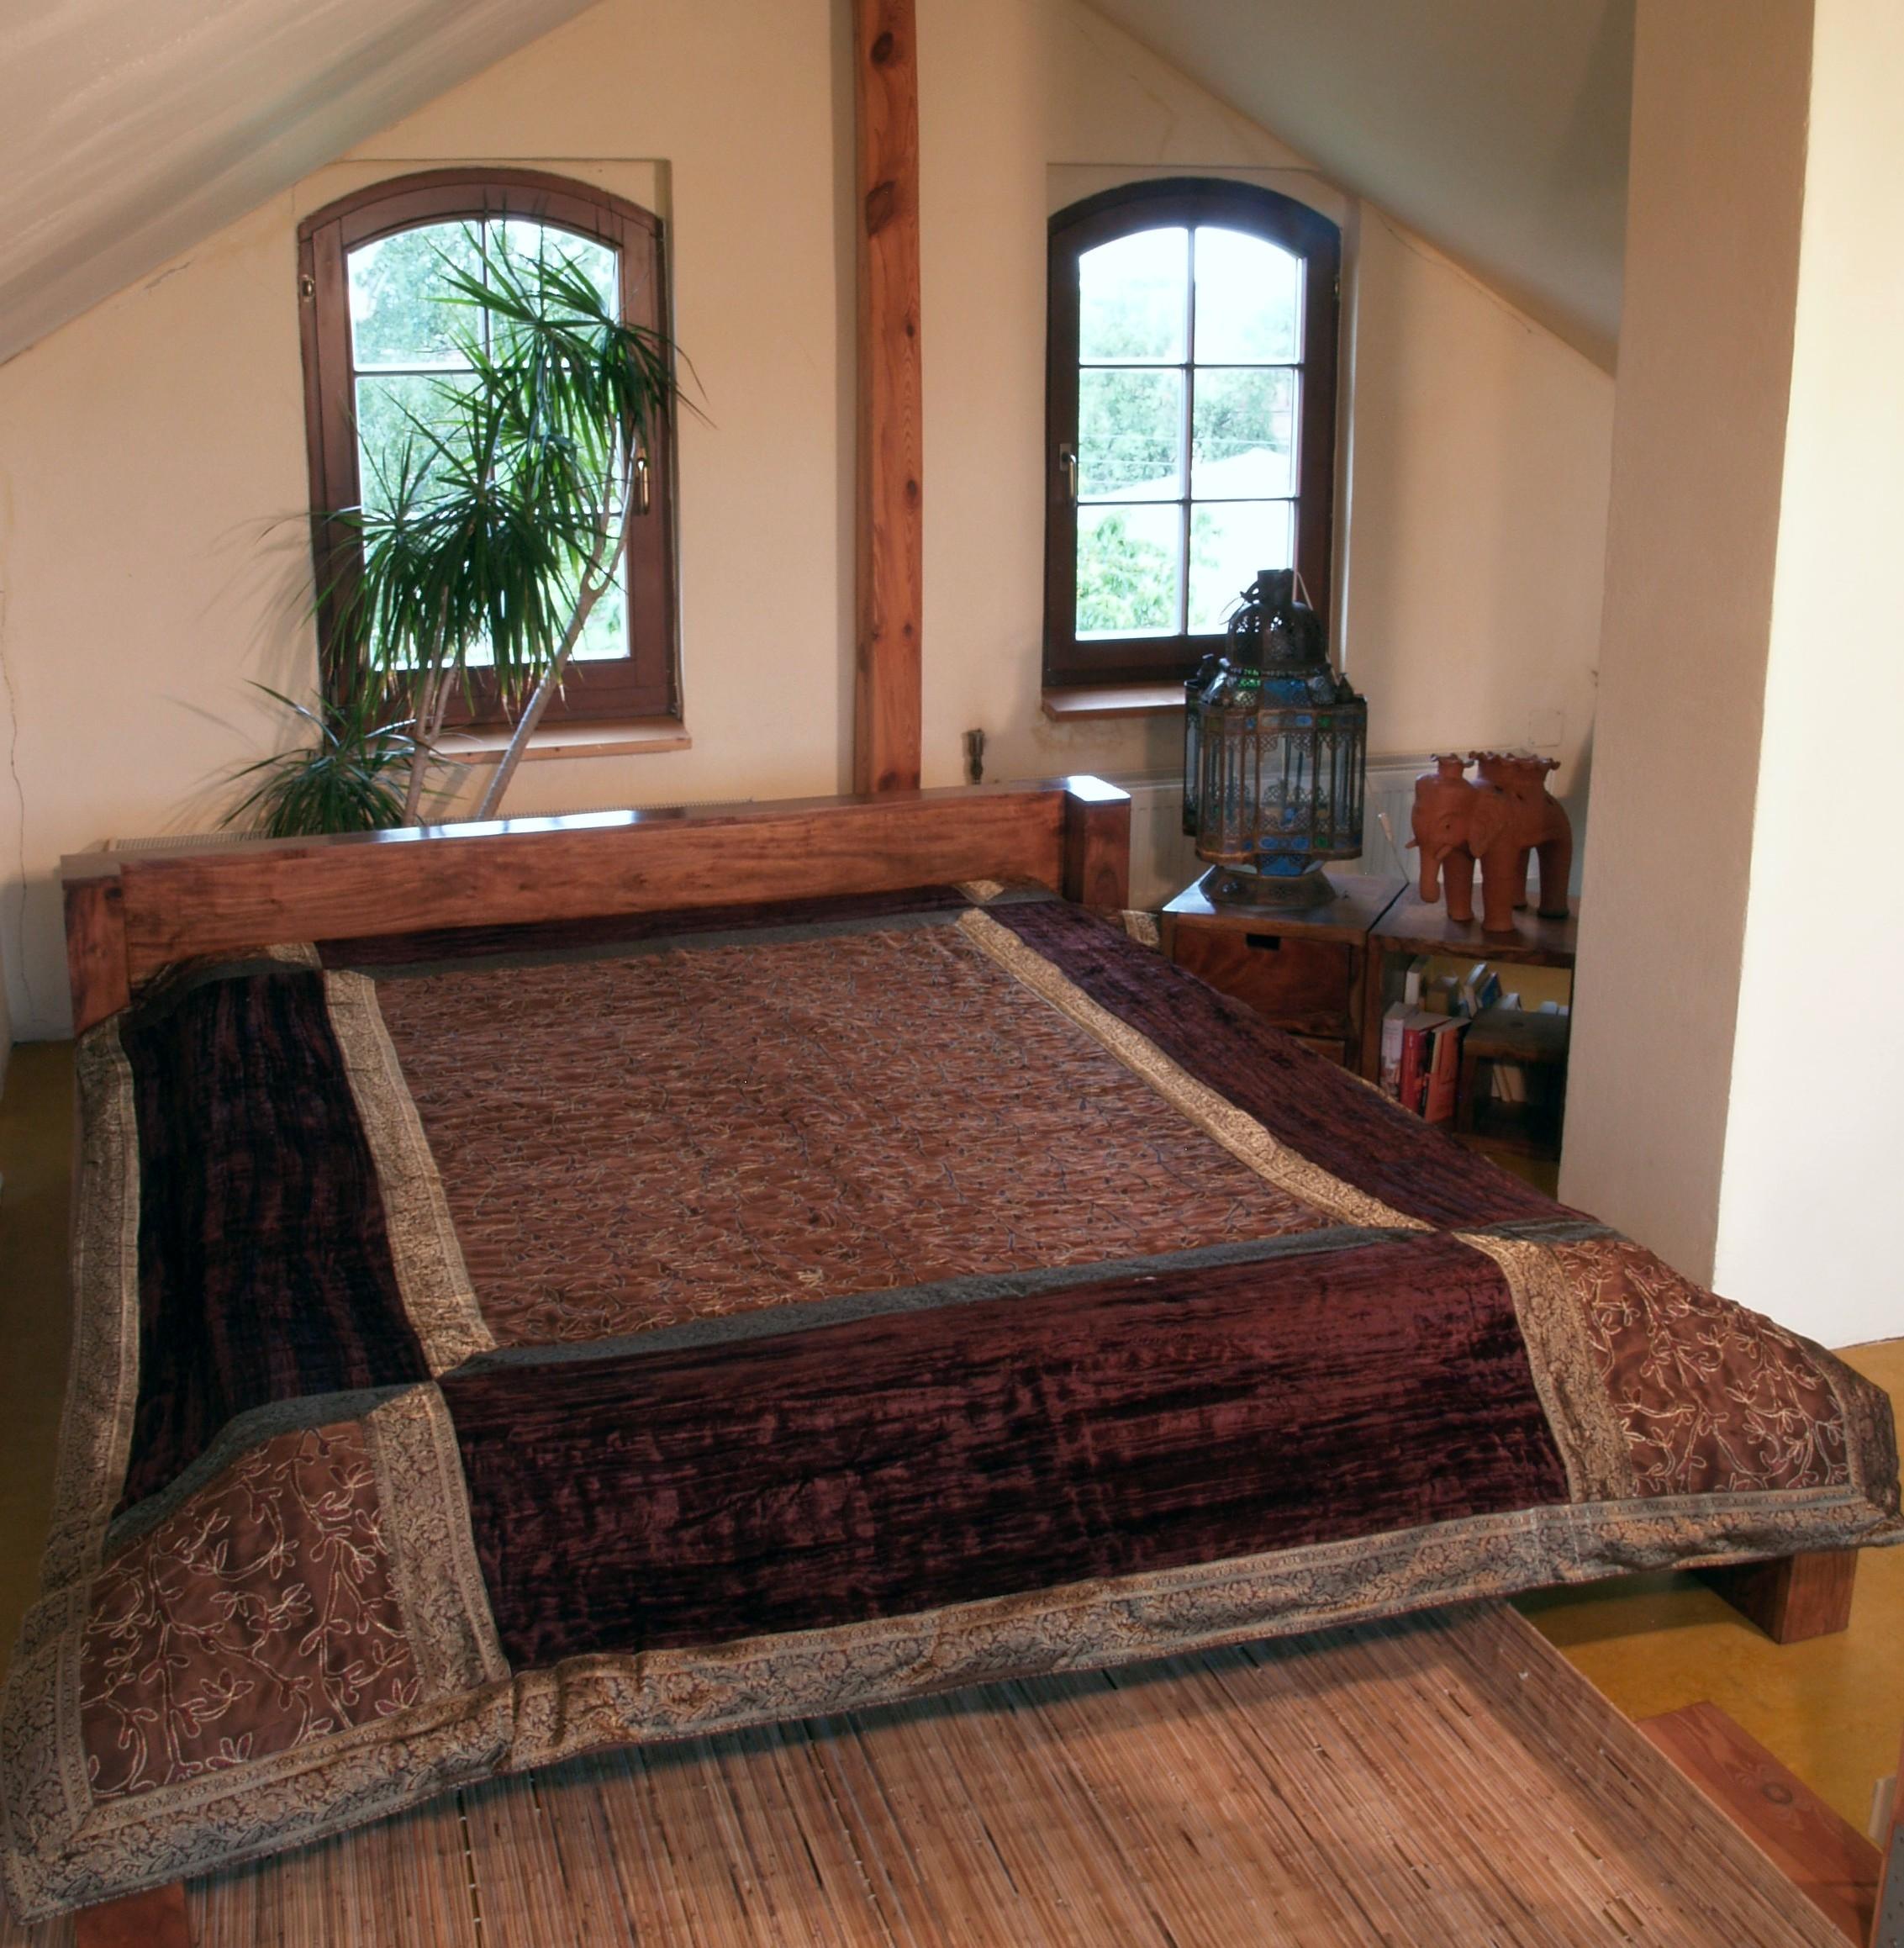 brokat samtdecke tagesdecke braun. Black Bedroom Furniture Sets. Home Design Ideas